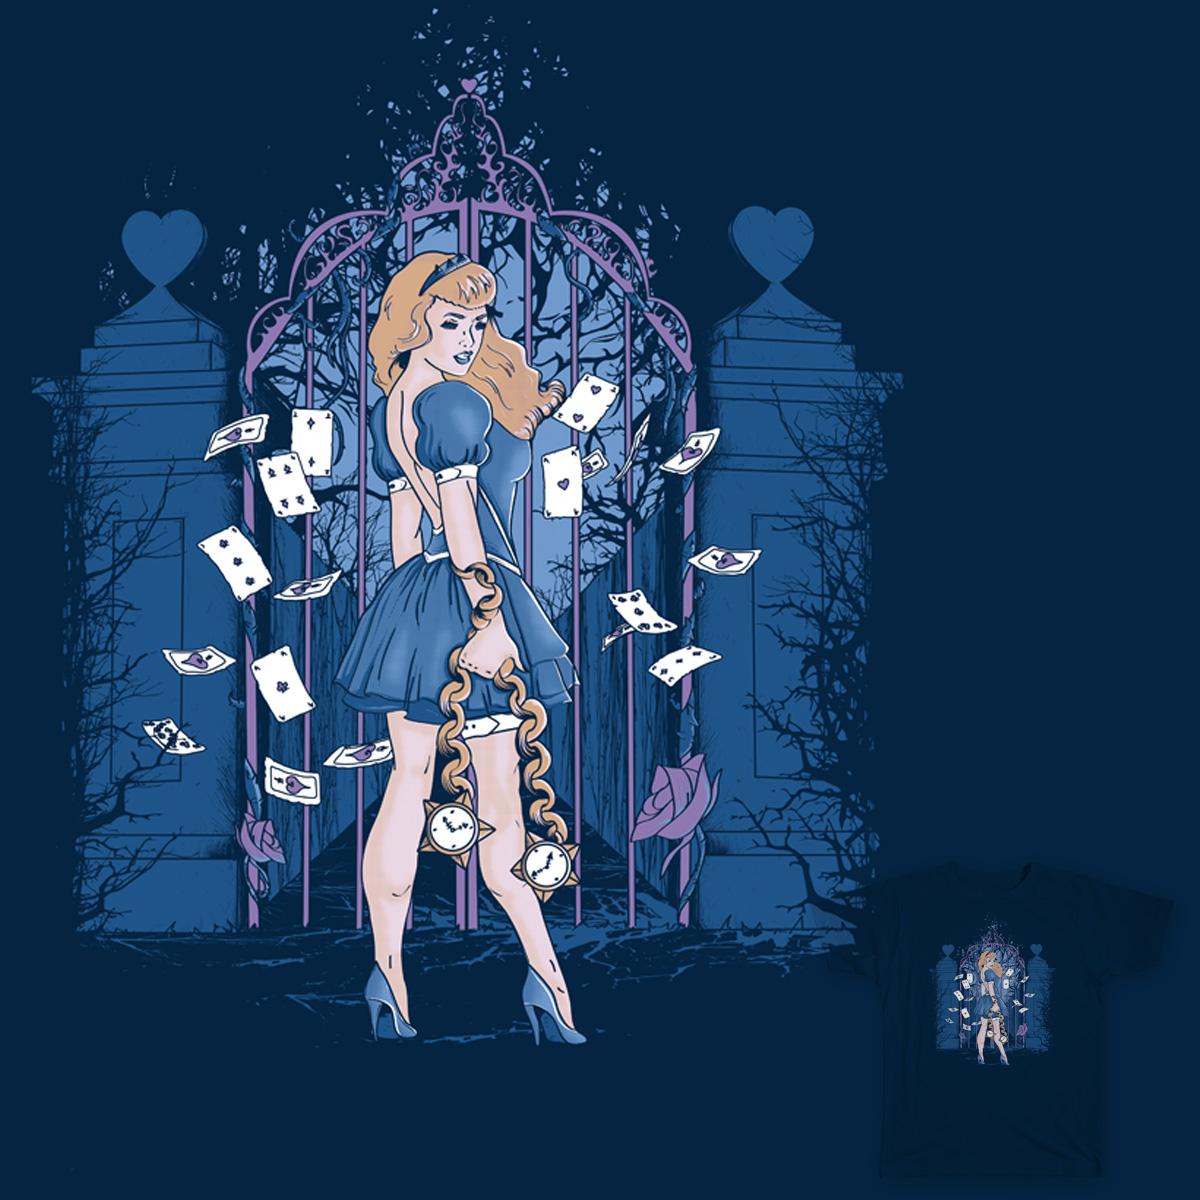 In my Wonderland by DonnieArt on Threadless